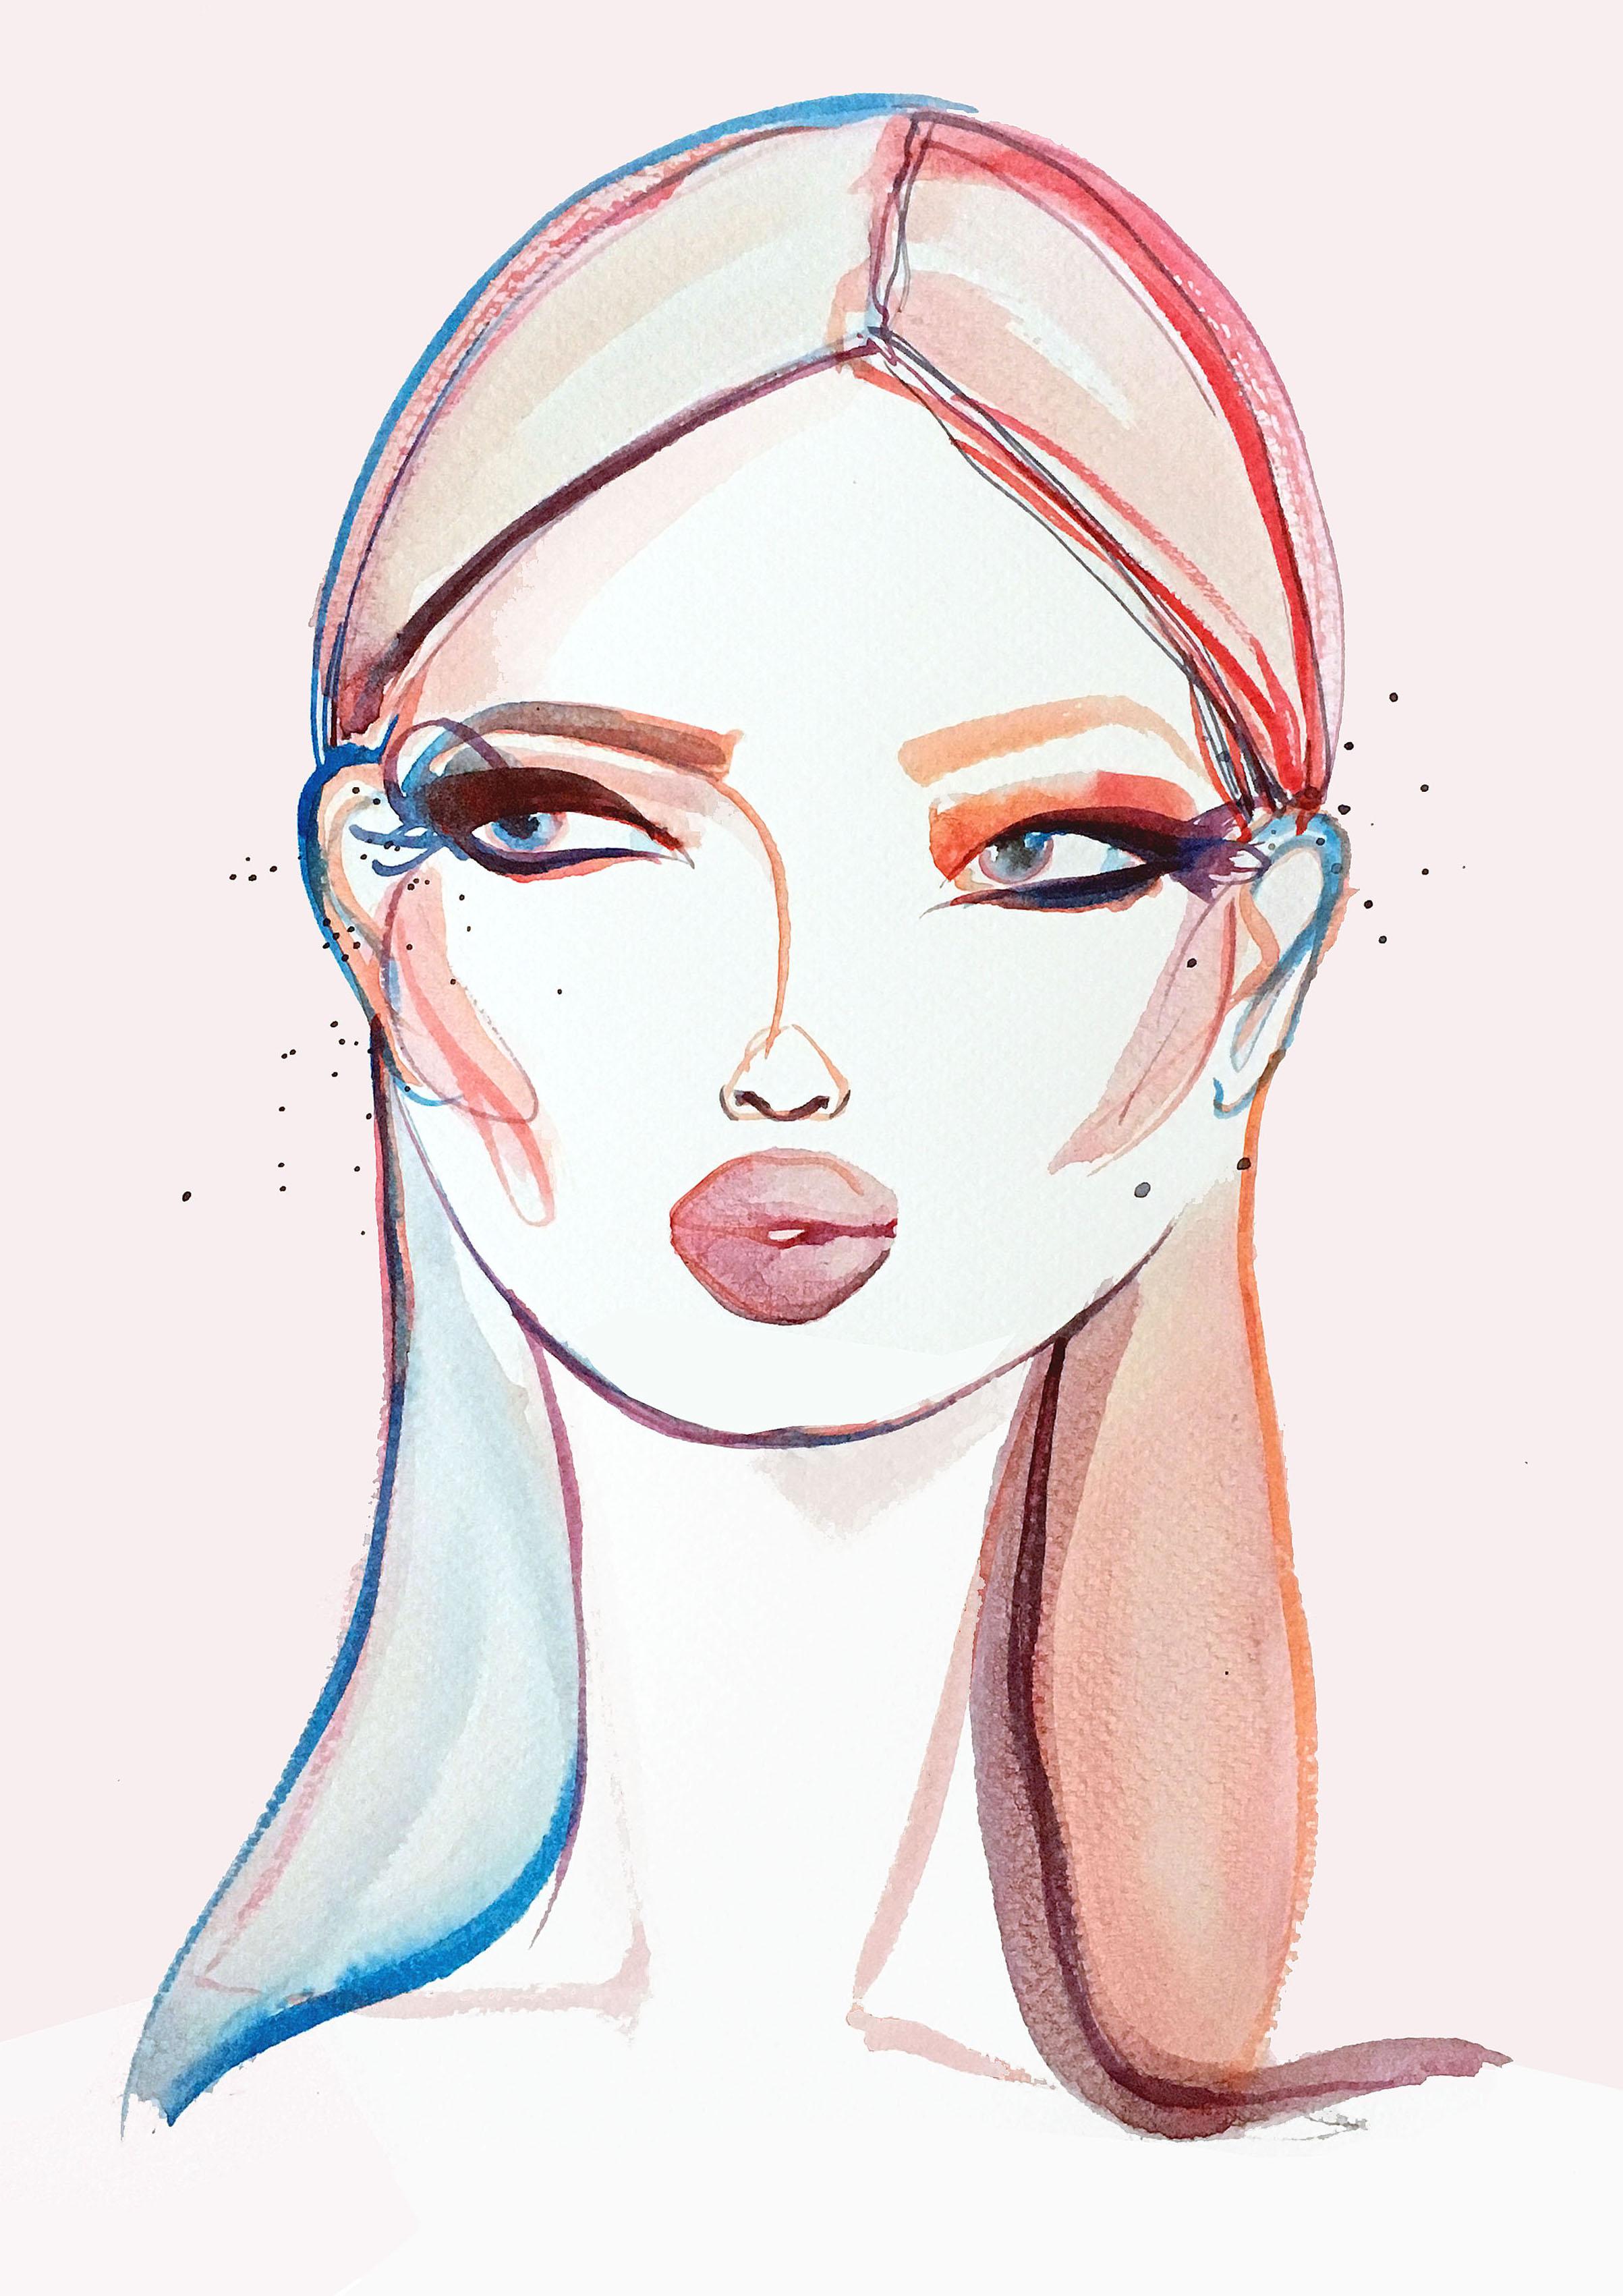 Pastel Pop - Ink illustration on paperA3 (29.7x42cm)£400